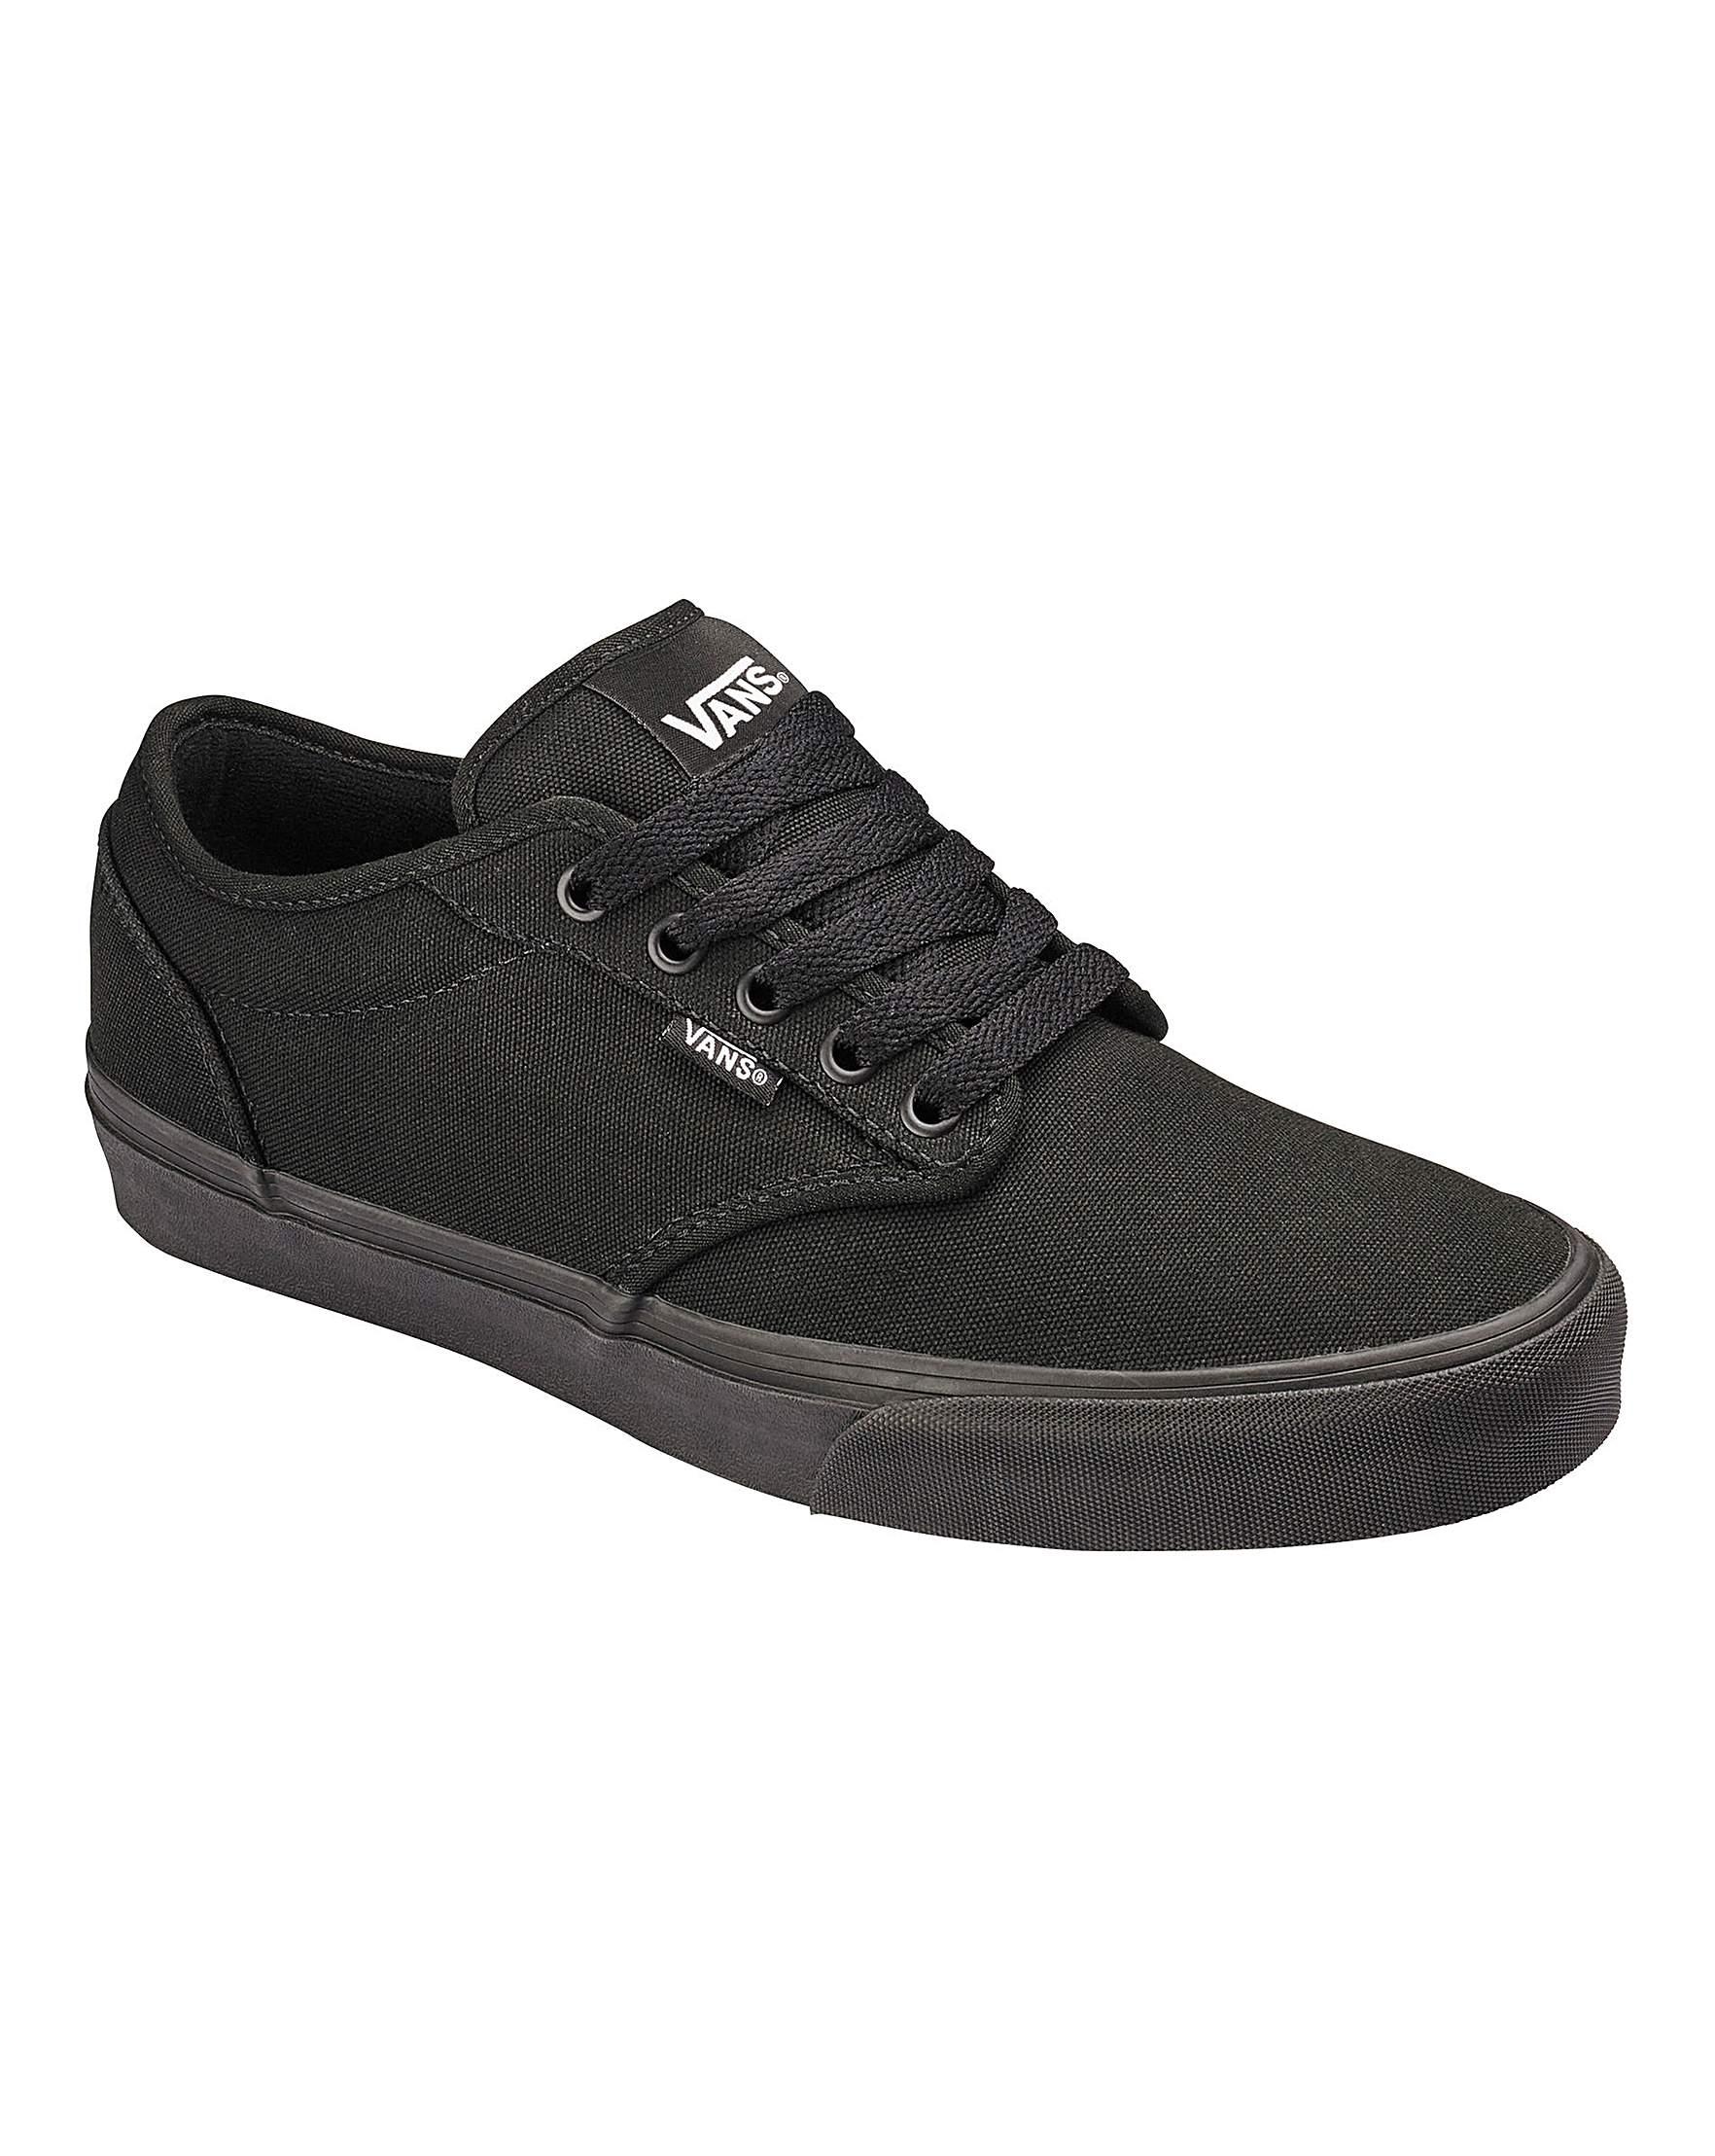 4ca7ec464d02 Vans Atwood Lace-Up Casual Shoes